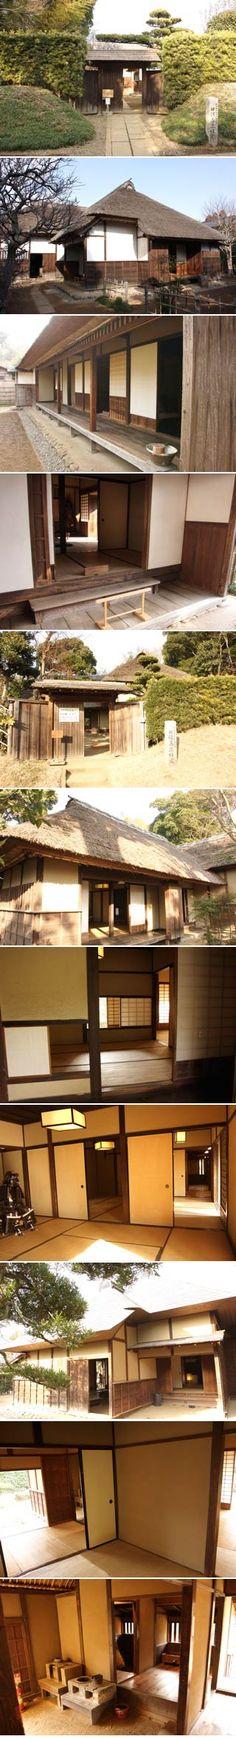 Kawara House | MustLoveJapan - Video Travel Guide of Japan